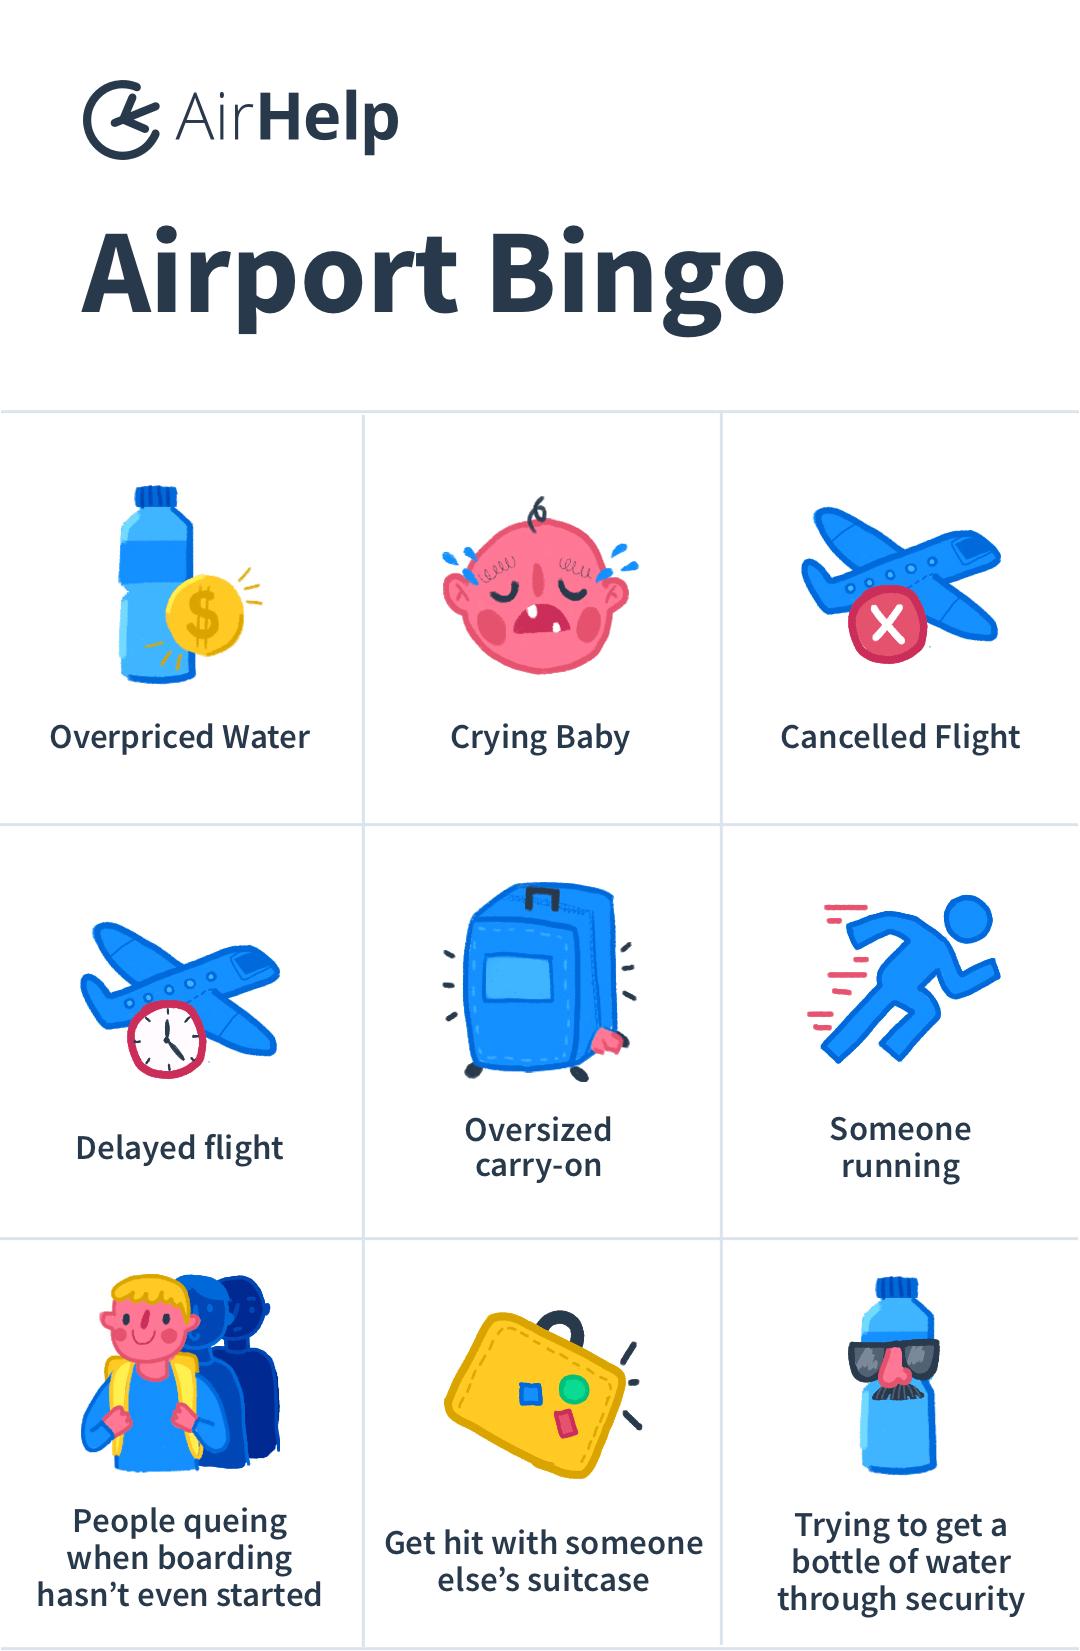 AirHelp airport bingo card